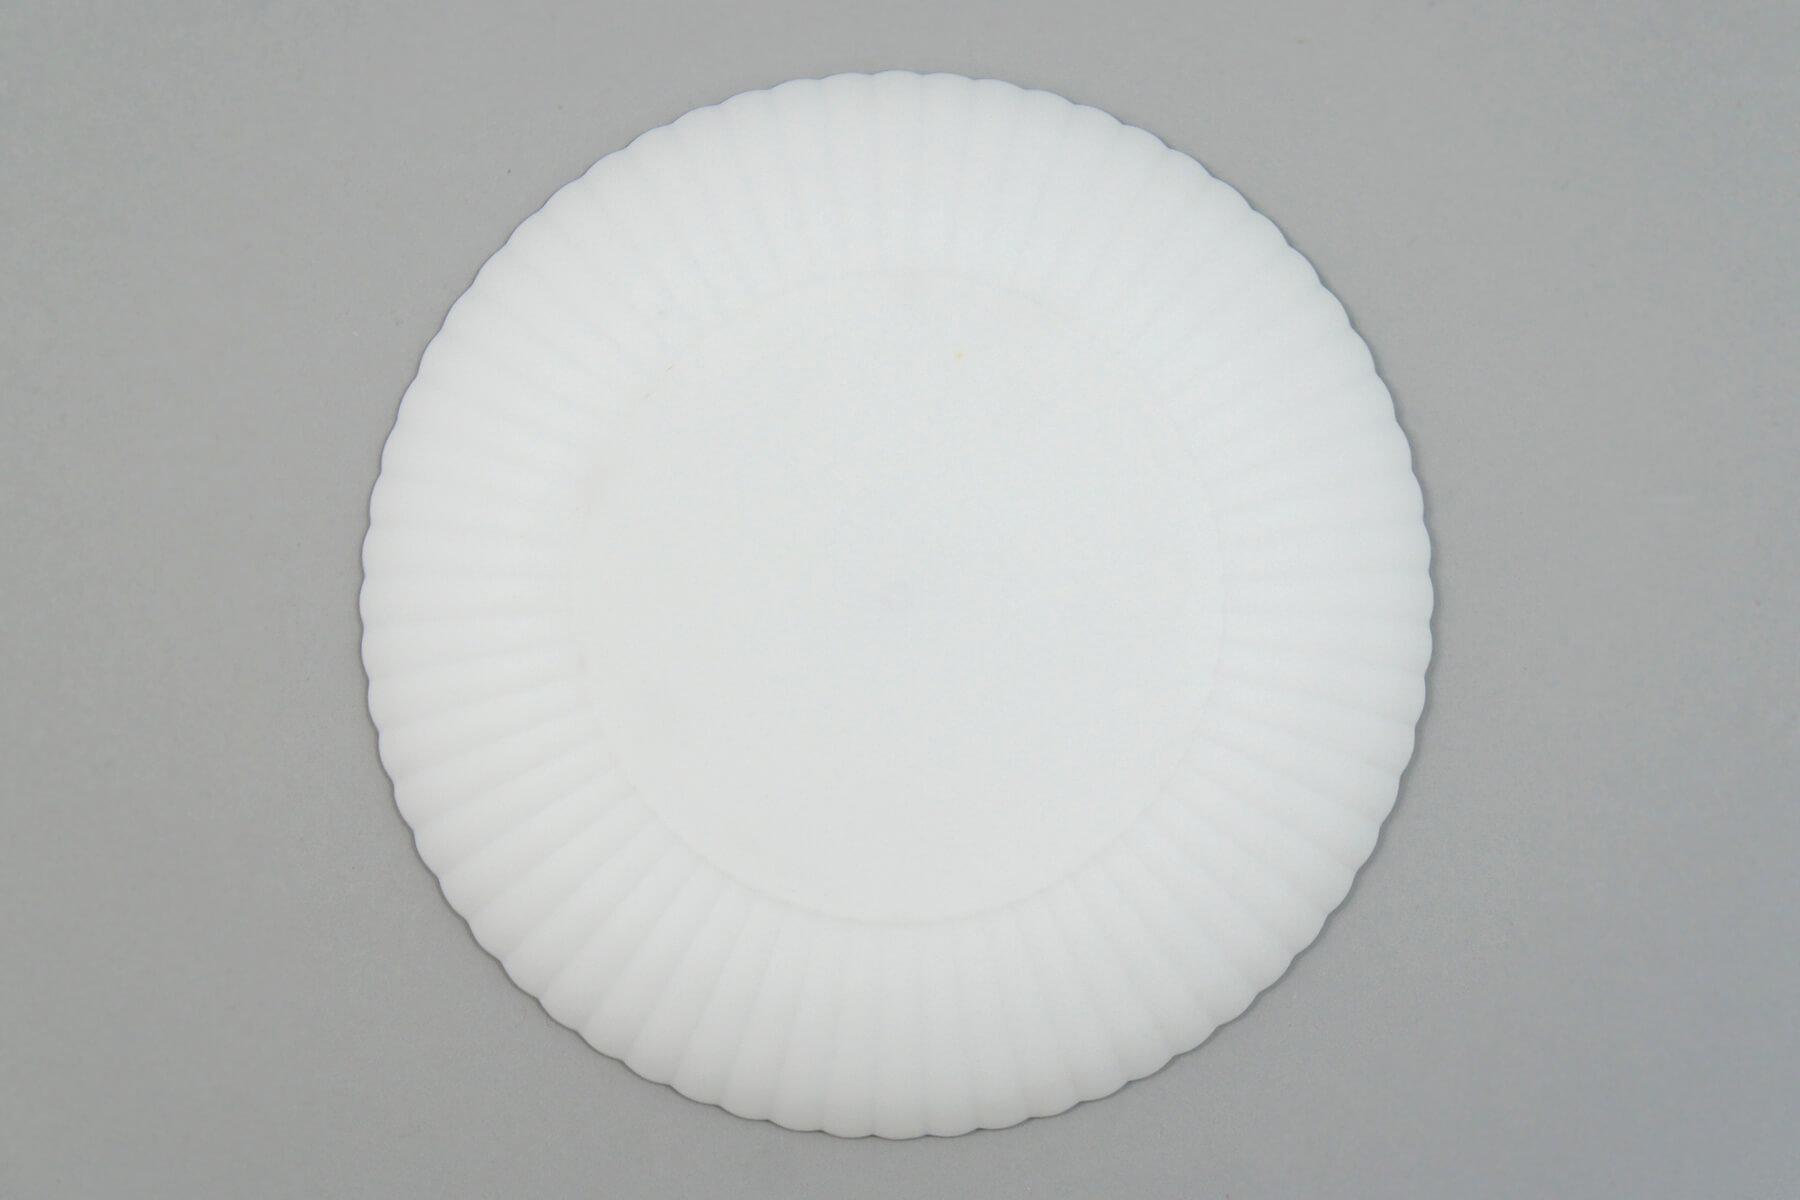 ymh0061